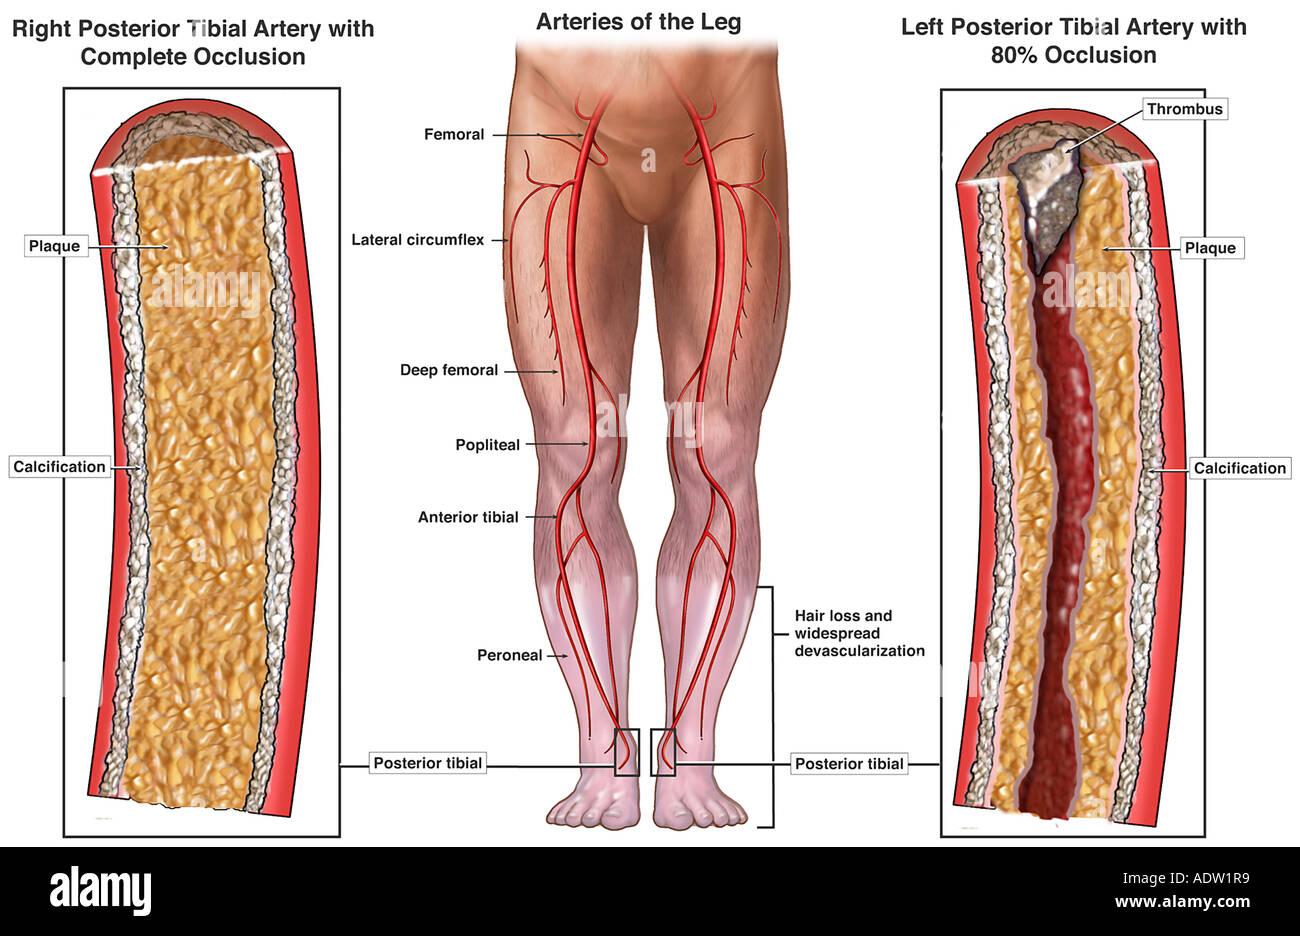 Blood Vessel Blockage Of The Lower Legs Stock Photo 7711288 Alamy